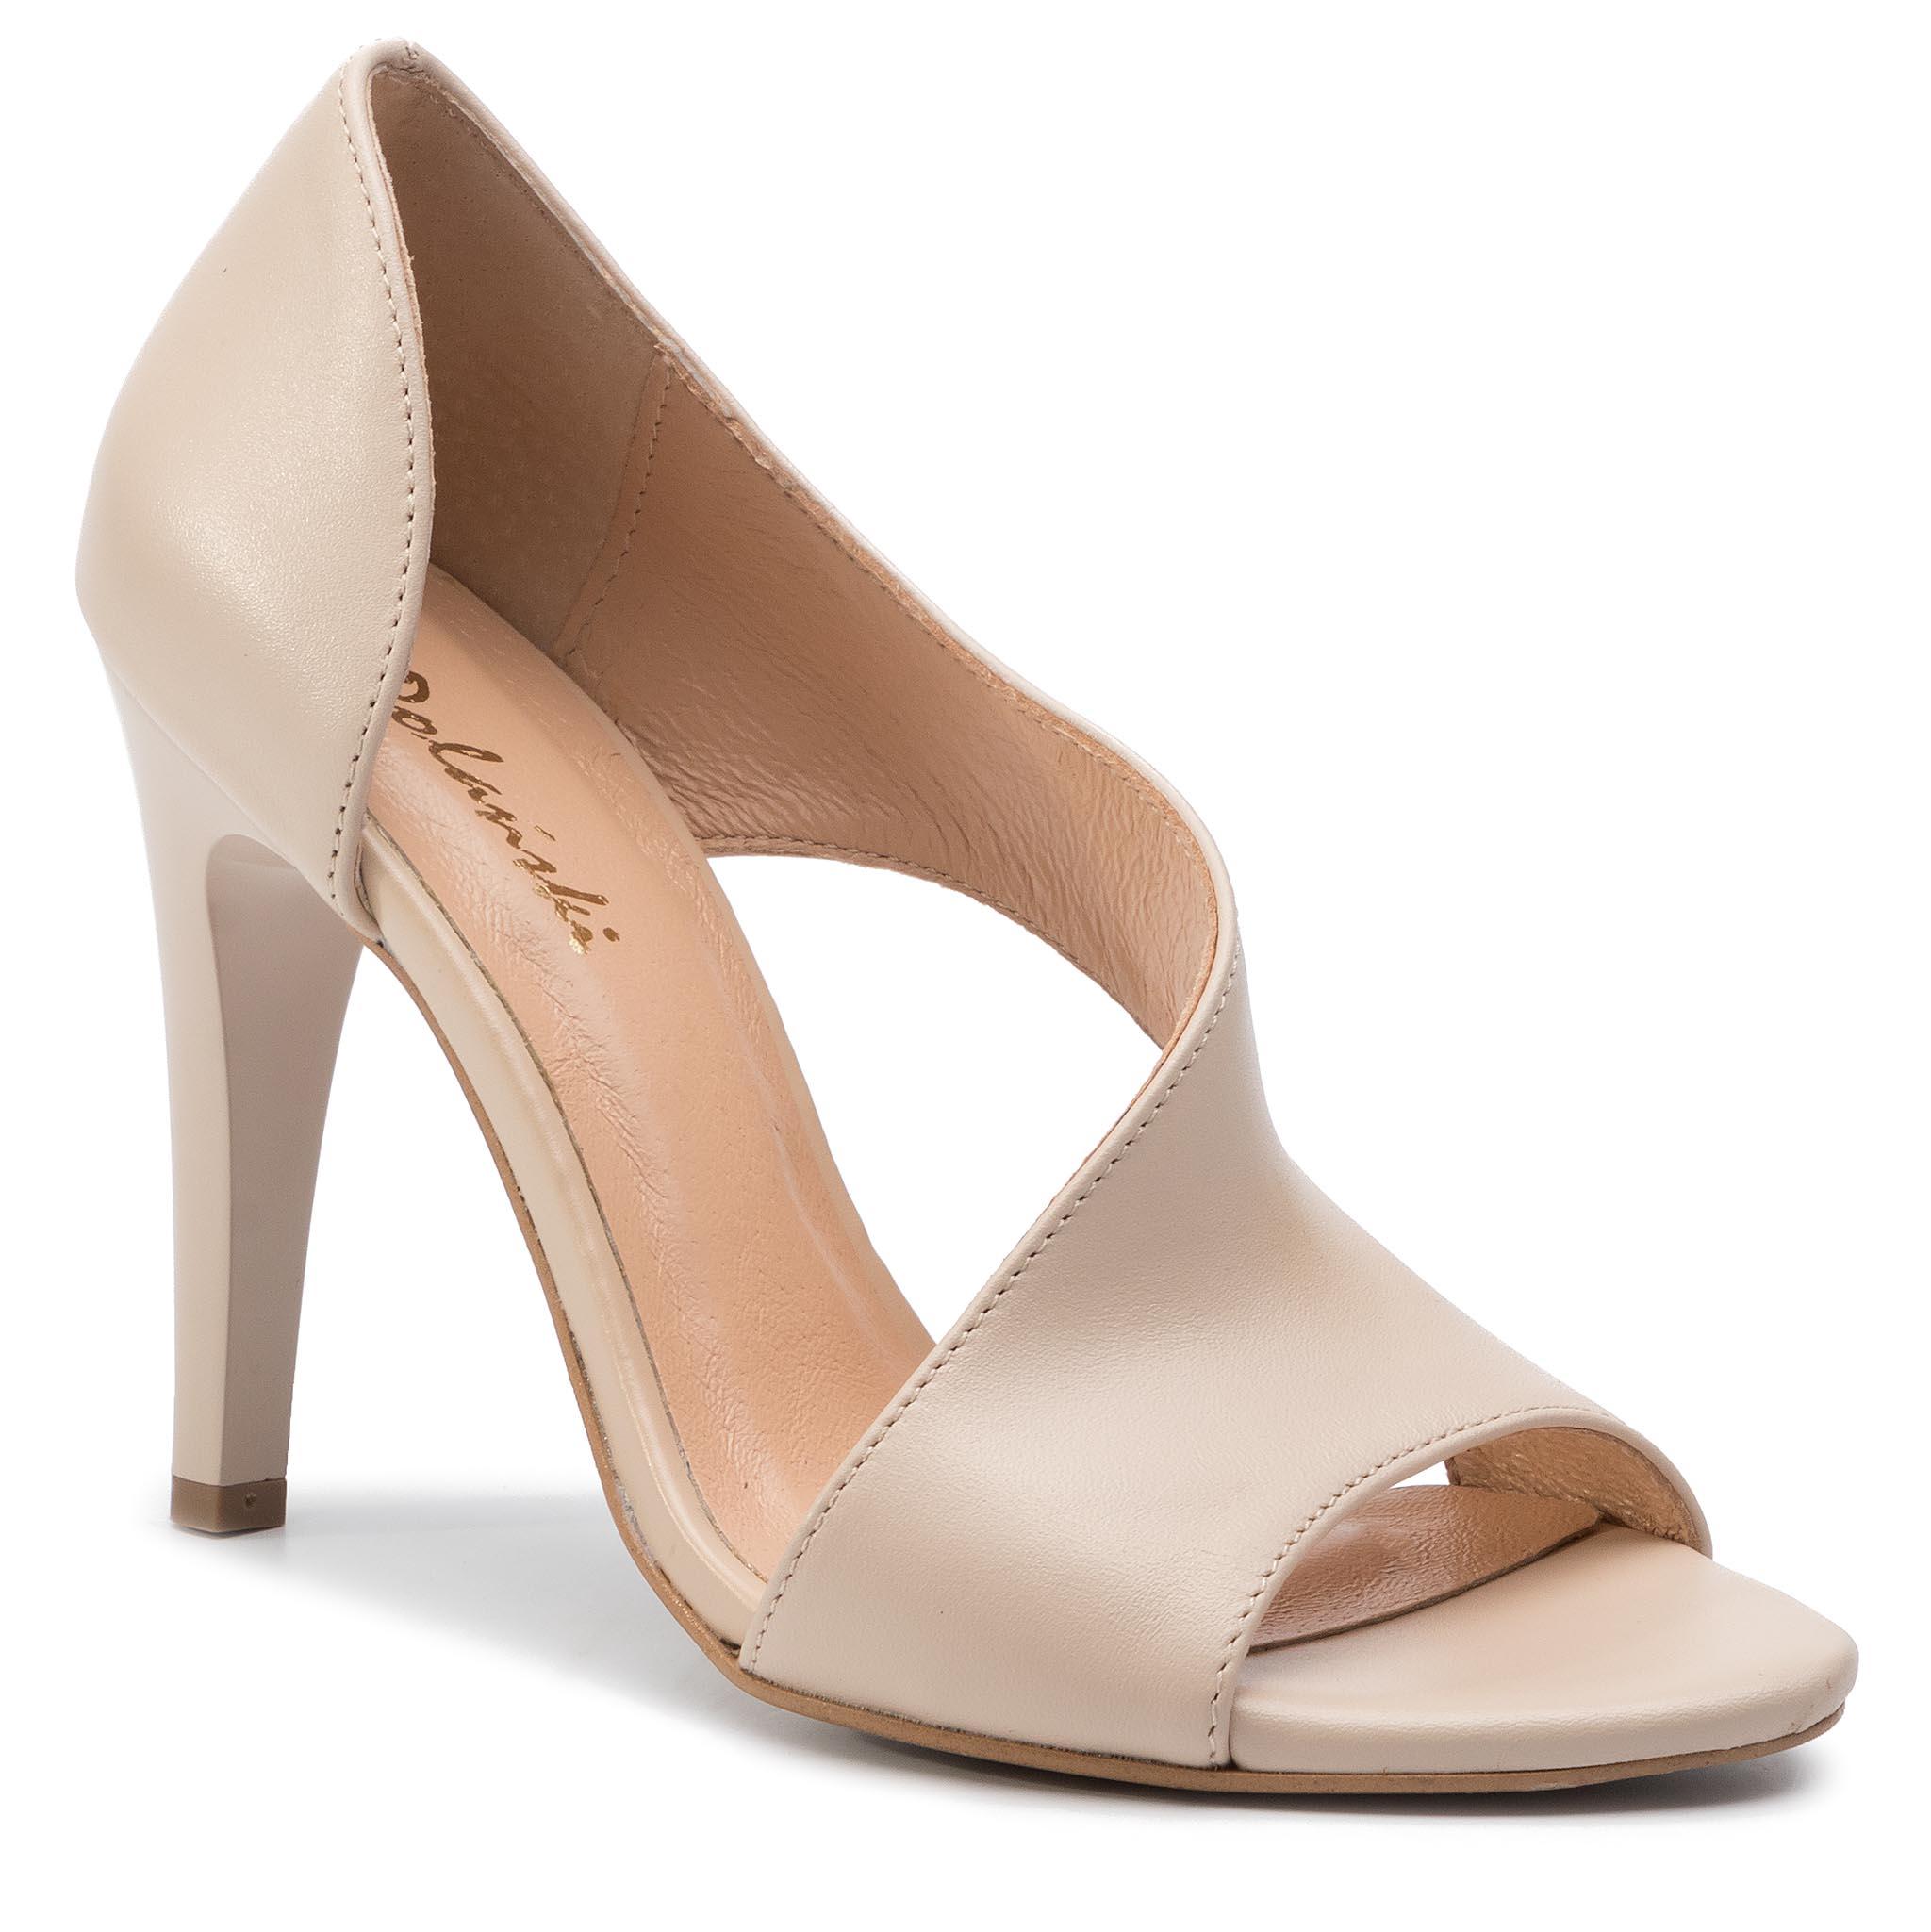 Image of High Heels R.POLAŃSKI - 0720 Beige